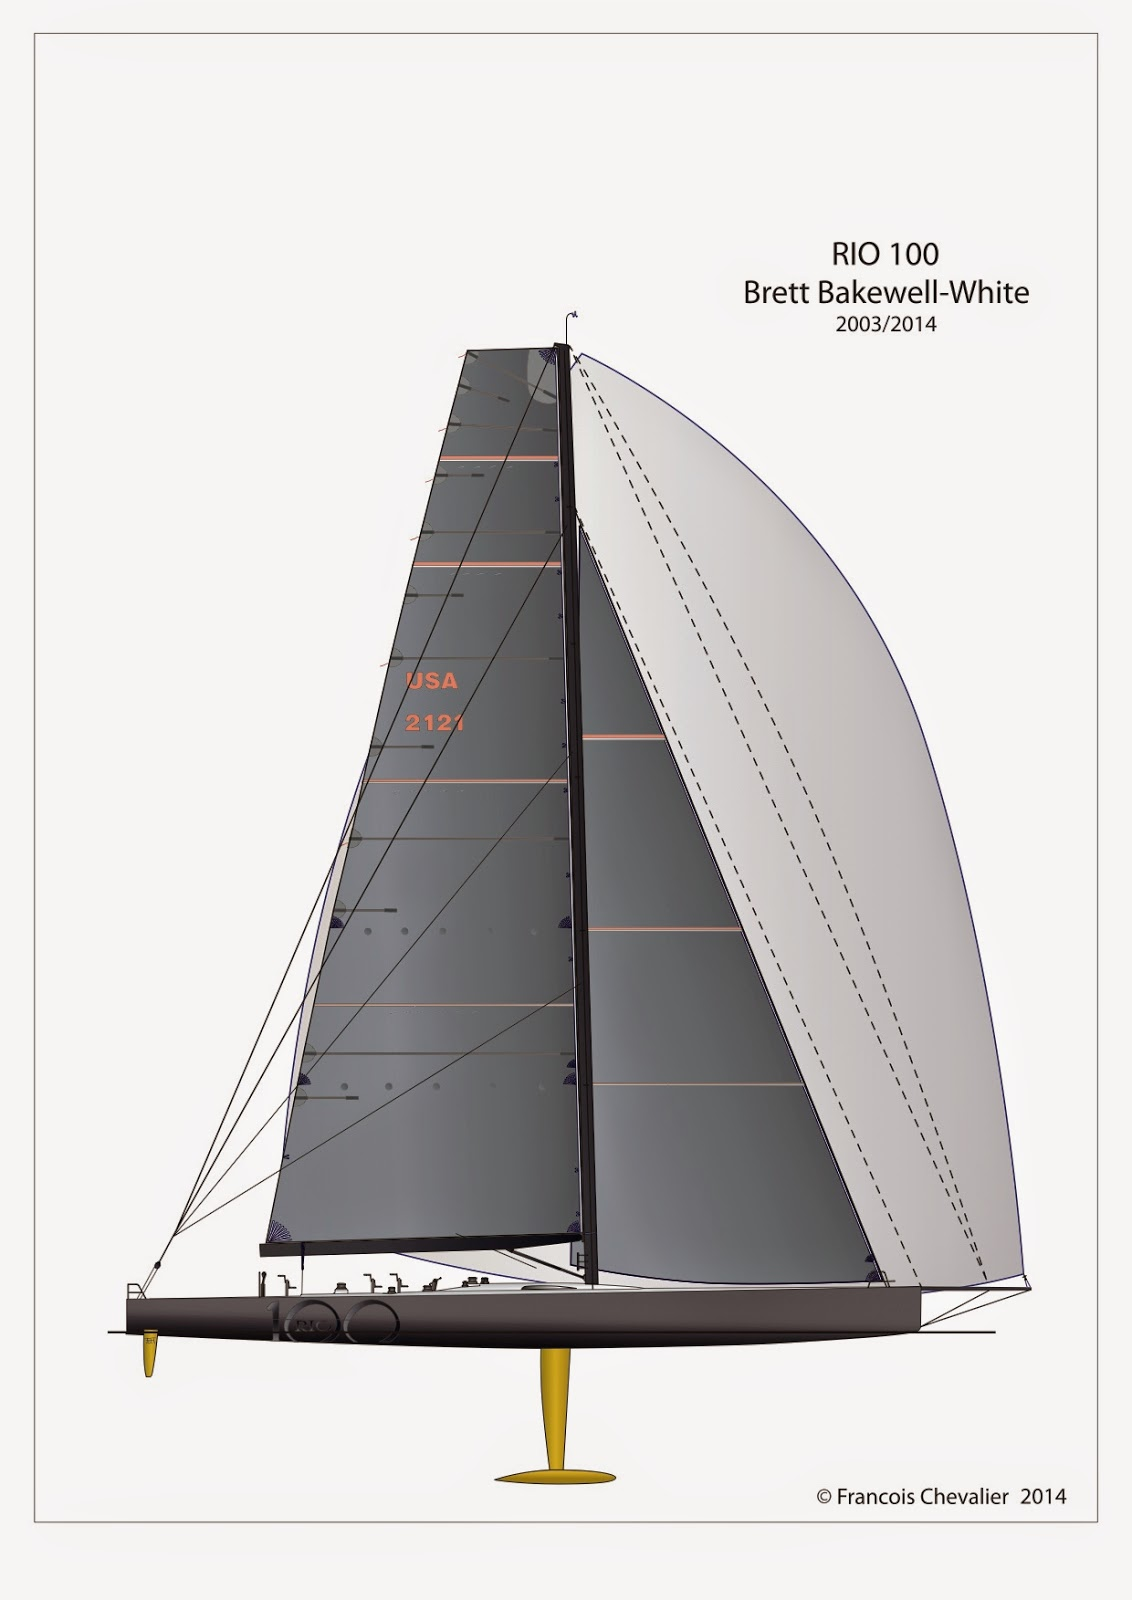 medium resolution of racing yacht diagram wiring diagram source rc boat diagram racing yacht diagram